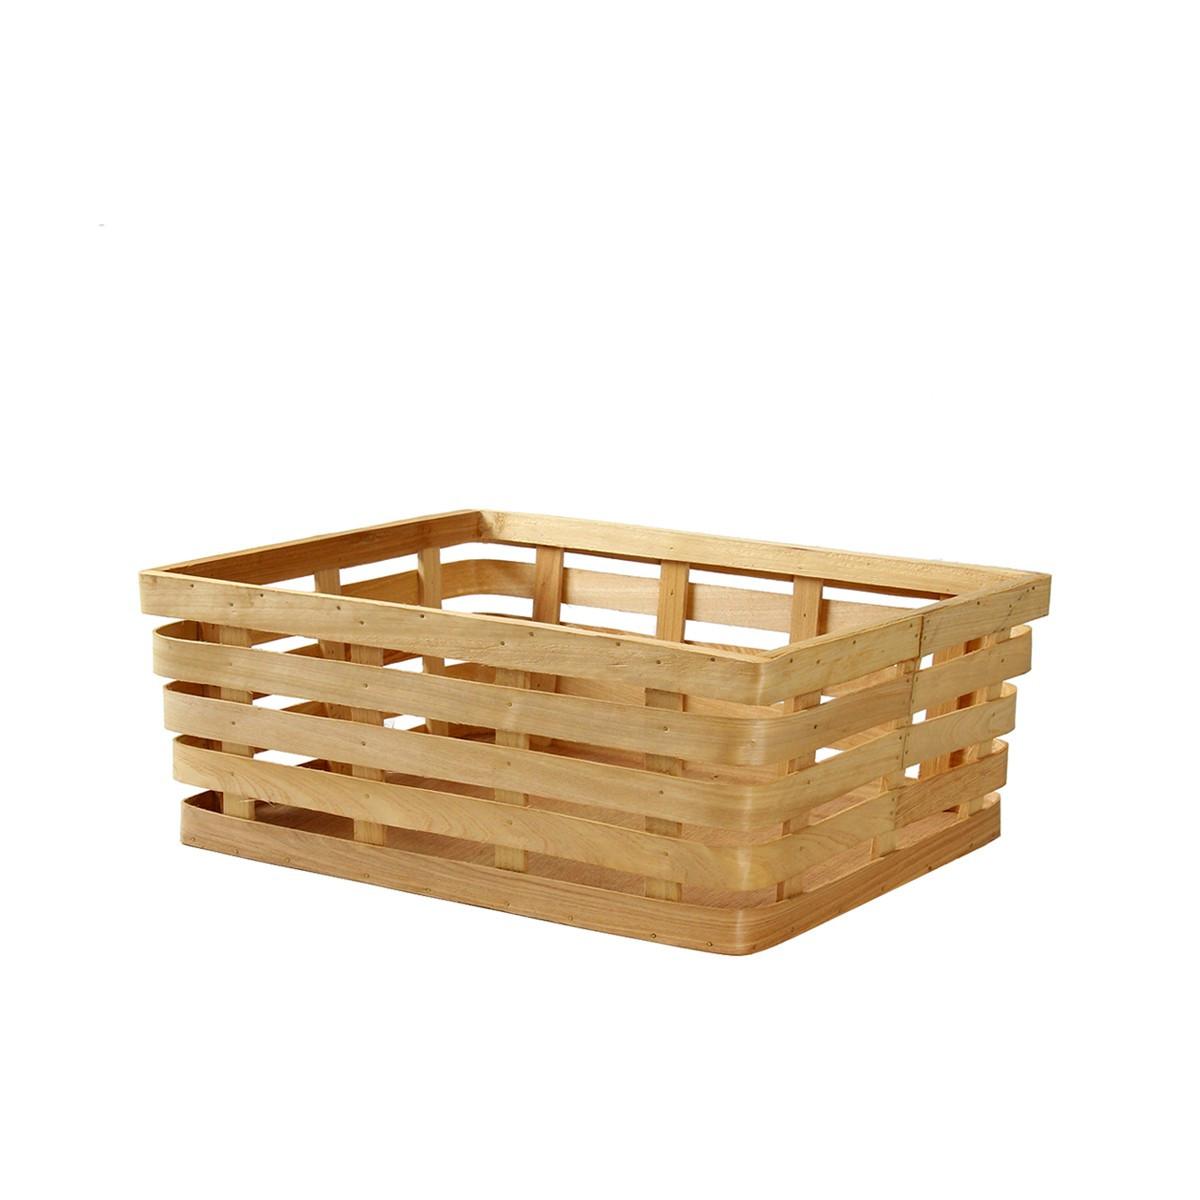 Panier de rangement rectangulaire en lattes de bois blond small - Panier de rangement rectangulaire ...